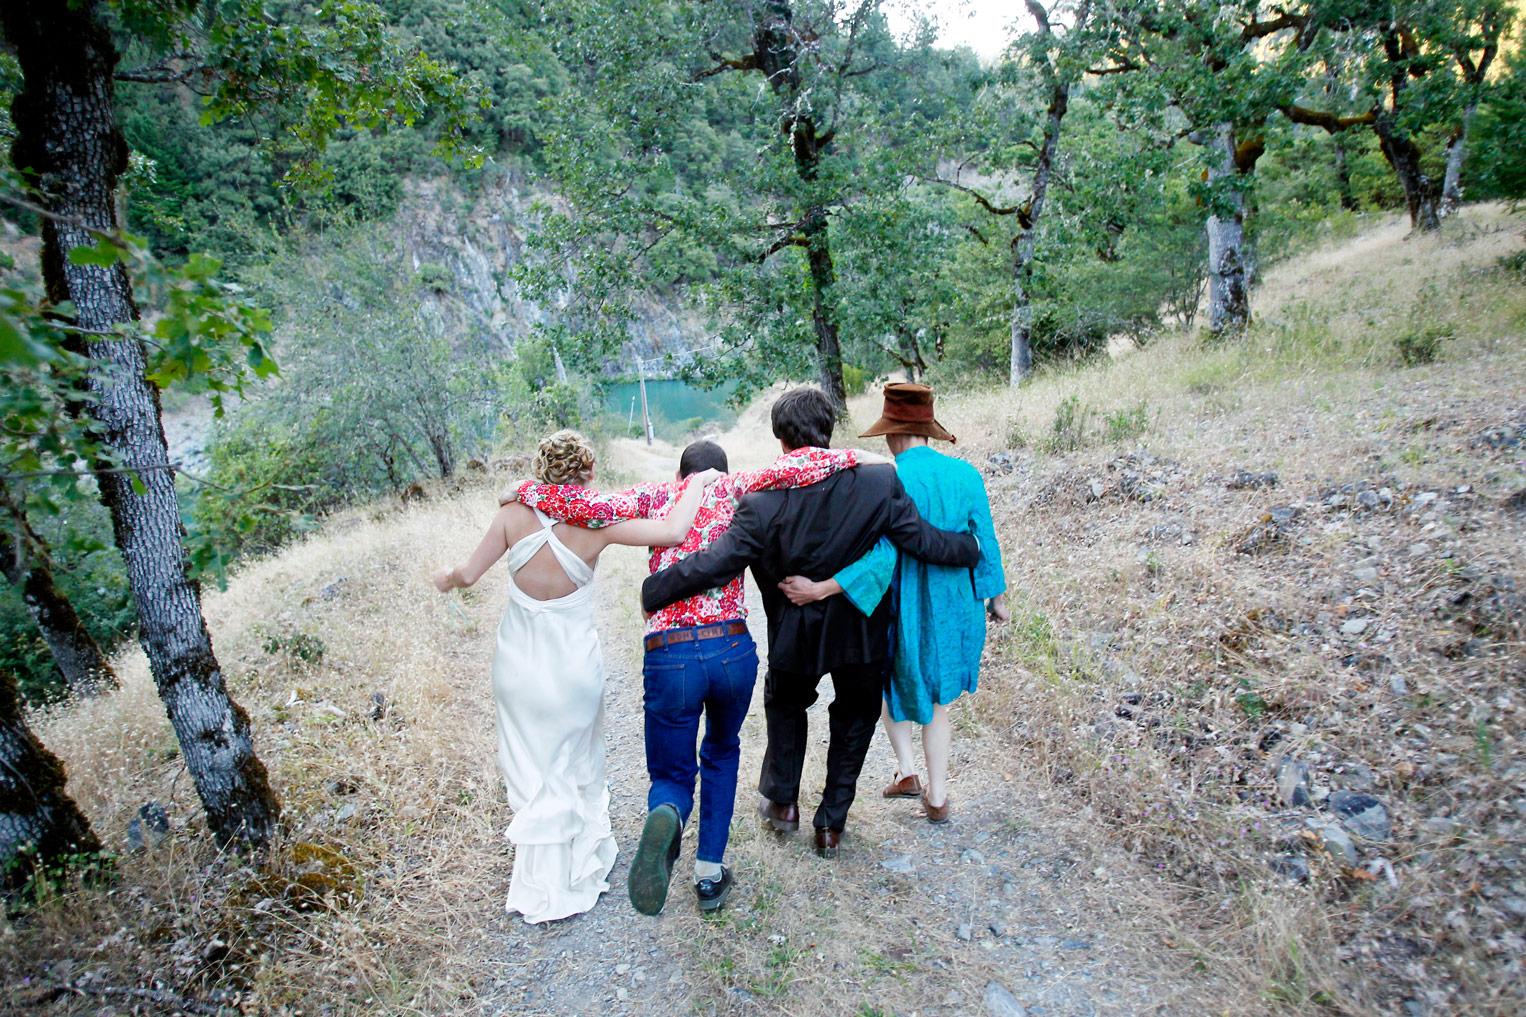 rustic-outdoor-trinity-river-wedding-ruthie-hauge-photography-39.jpg